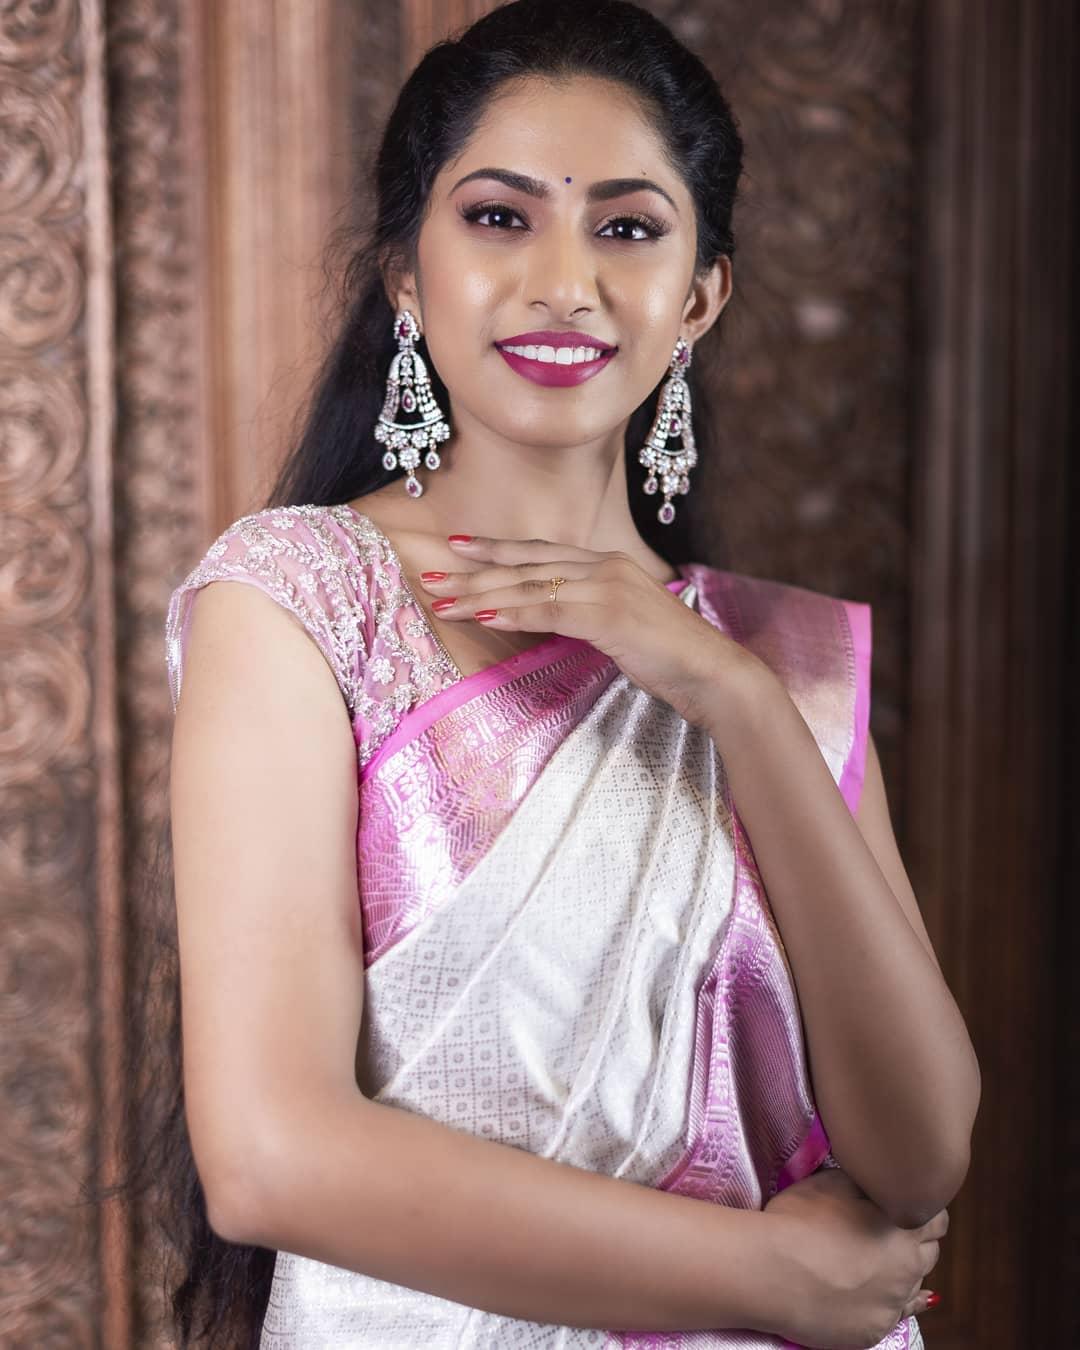 White And Pink Venkatagiri Silk Saree Is A Royalty To Drape Around A Simple Yet Elegant